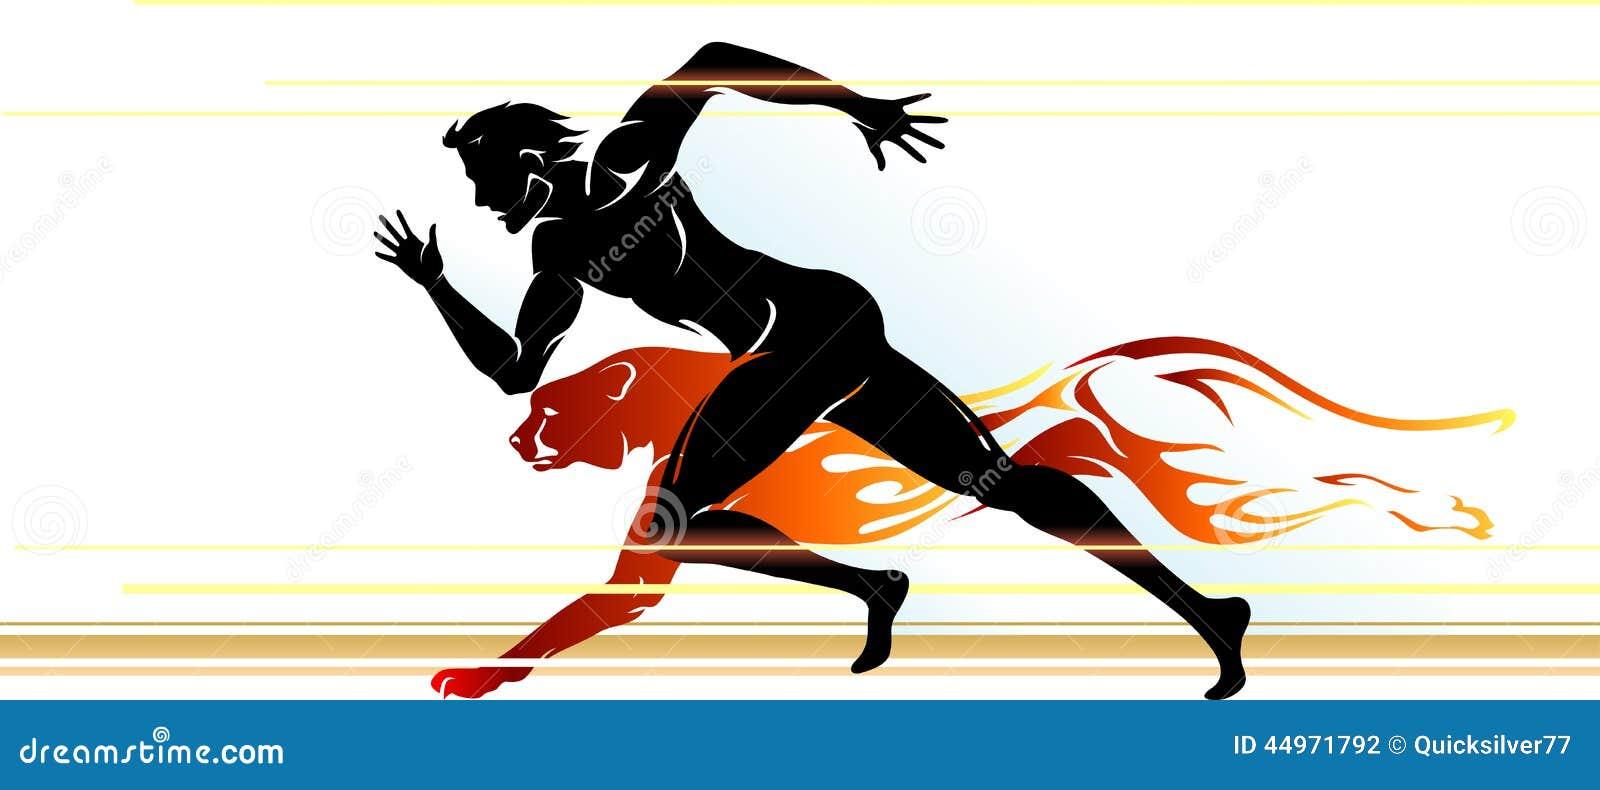 superhuman speed runner stock illustration image of action 44971792 Cheetah Paw Print Clip Art Cheetah Print Background